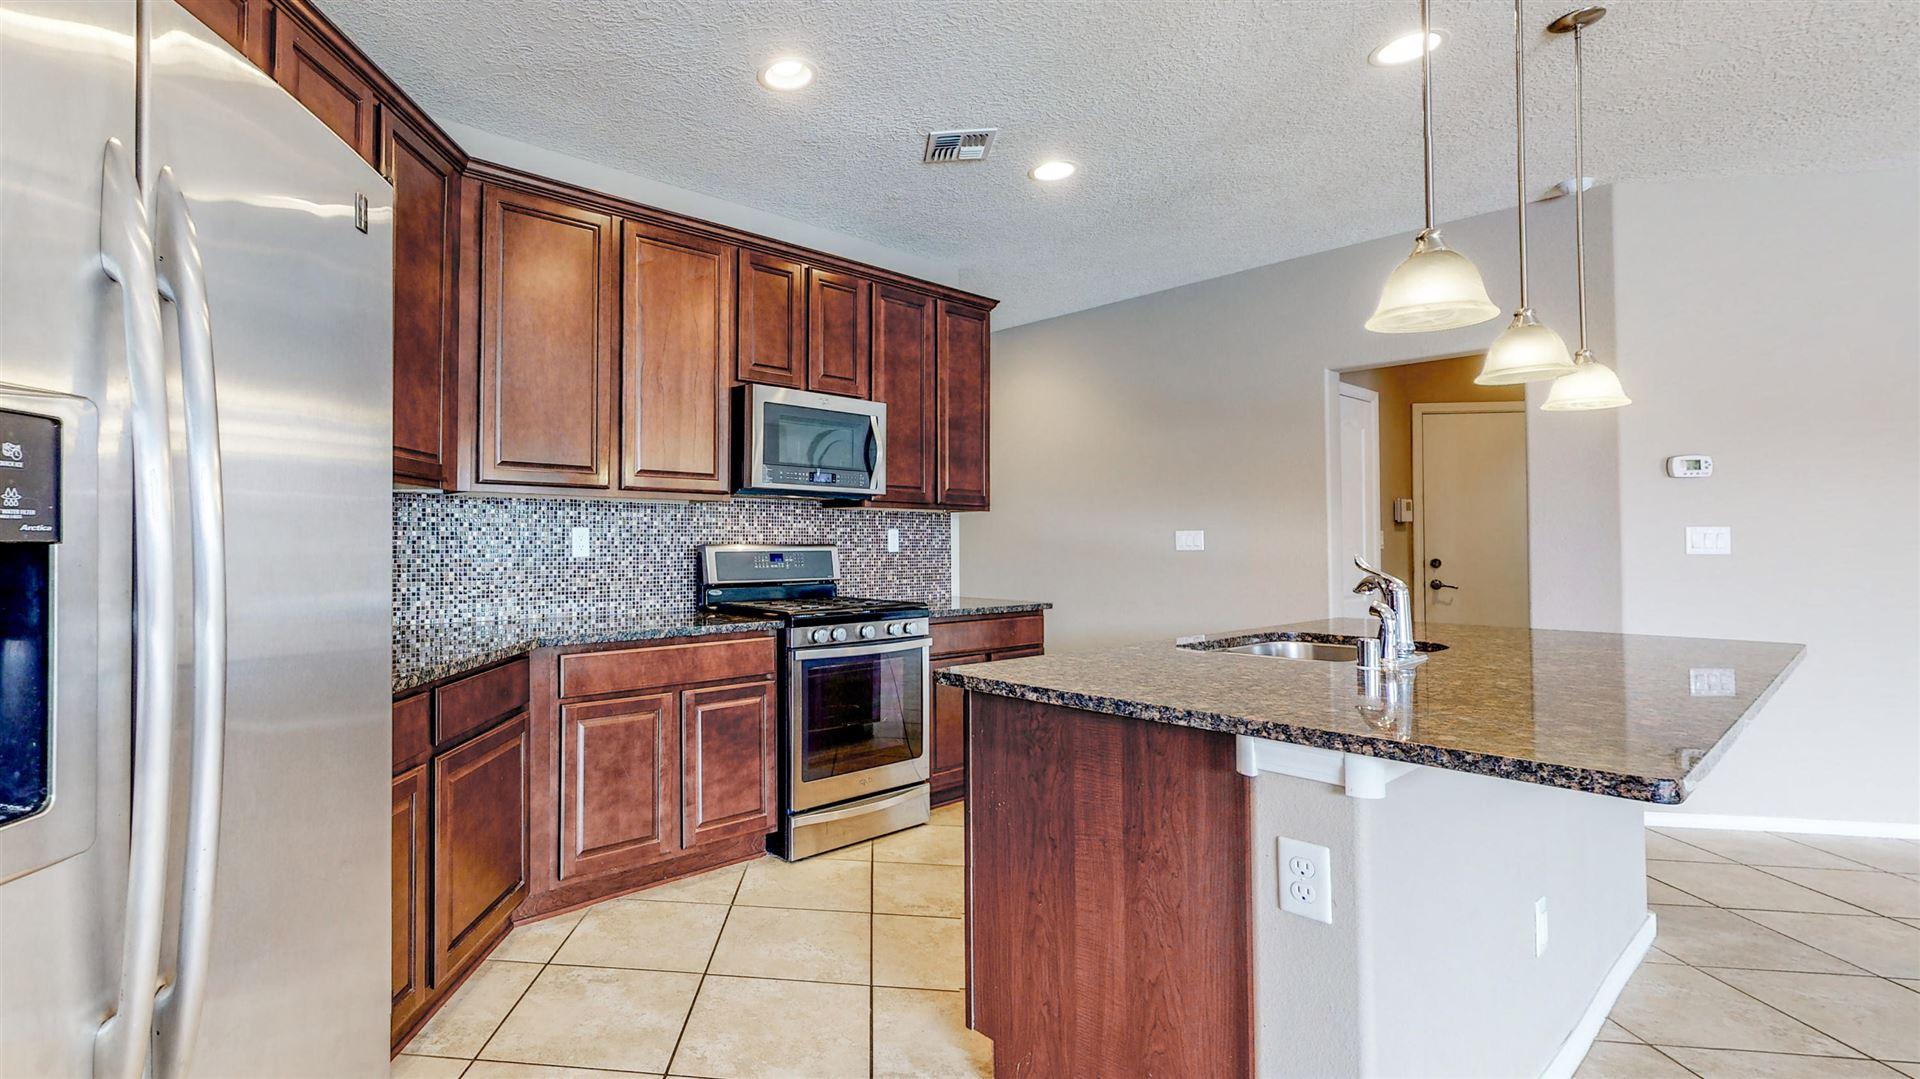 Photo of 3132 Llano Vista Court NE, Rio Rancho, NM 87124 (MLS # 980065)